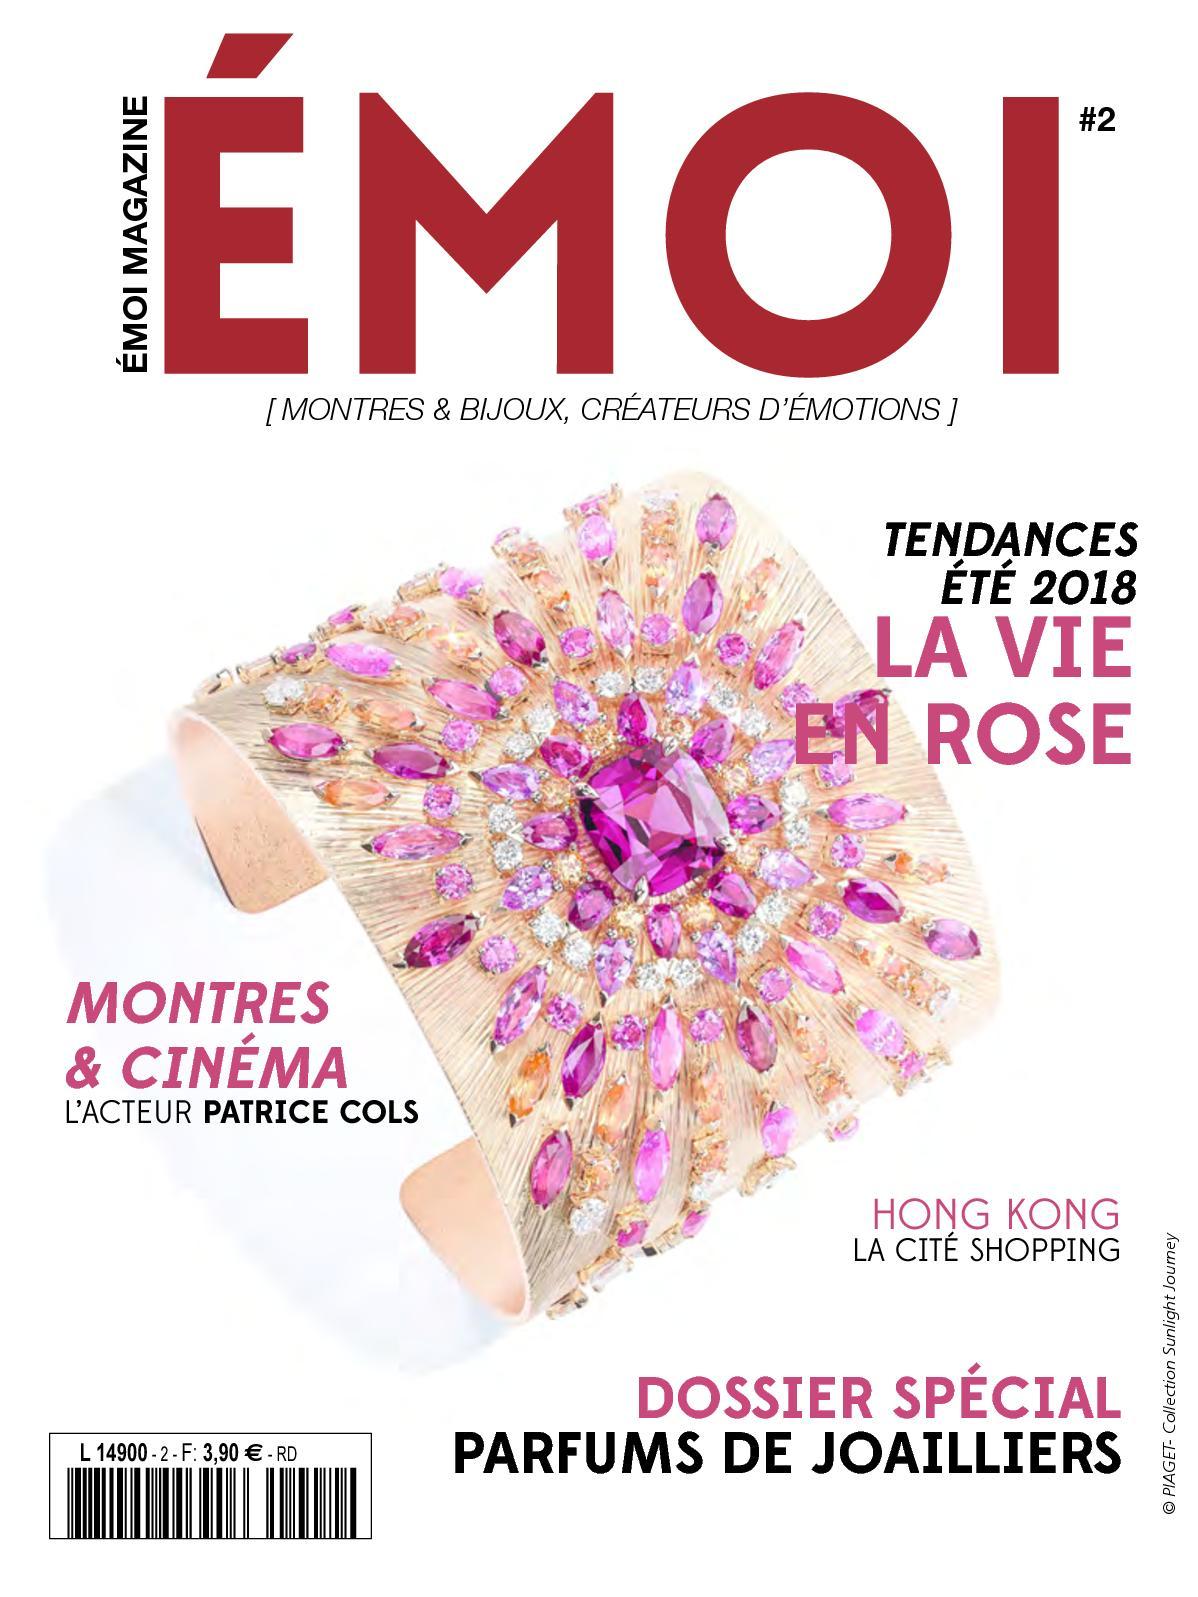 Calaméo - EMOI - ETE 2018 286542a2c5d